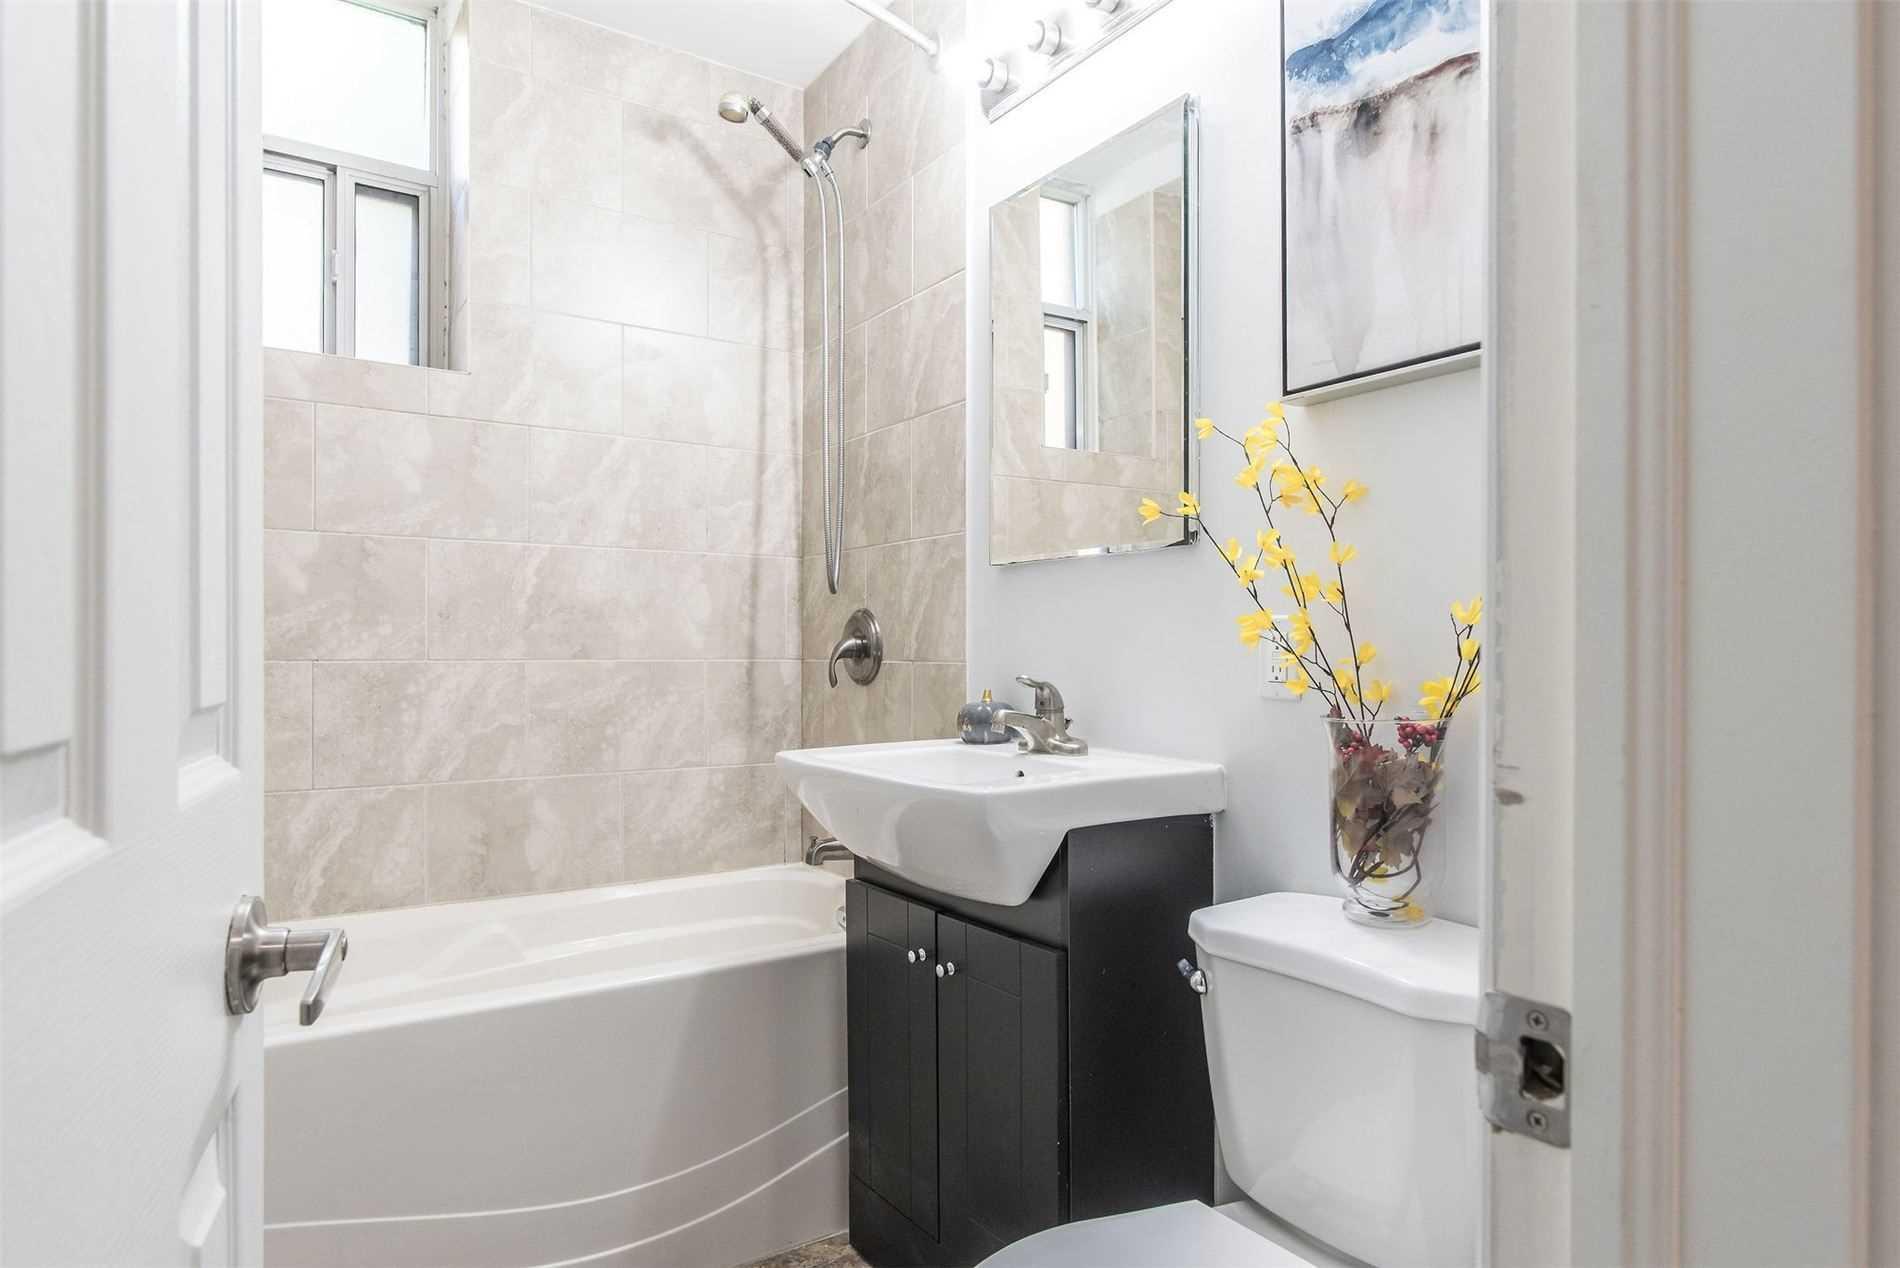 6 - 2550 Bathurst St - Forest Hill North Co-Ownership Apt for sale, 1 Bedroom (C5381382) - #8